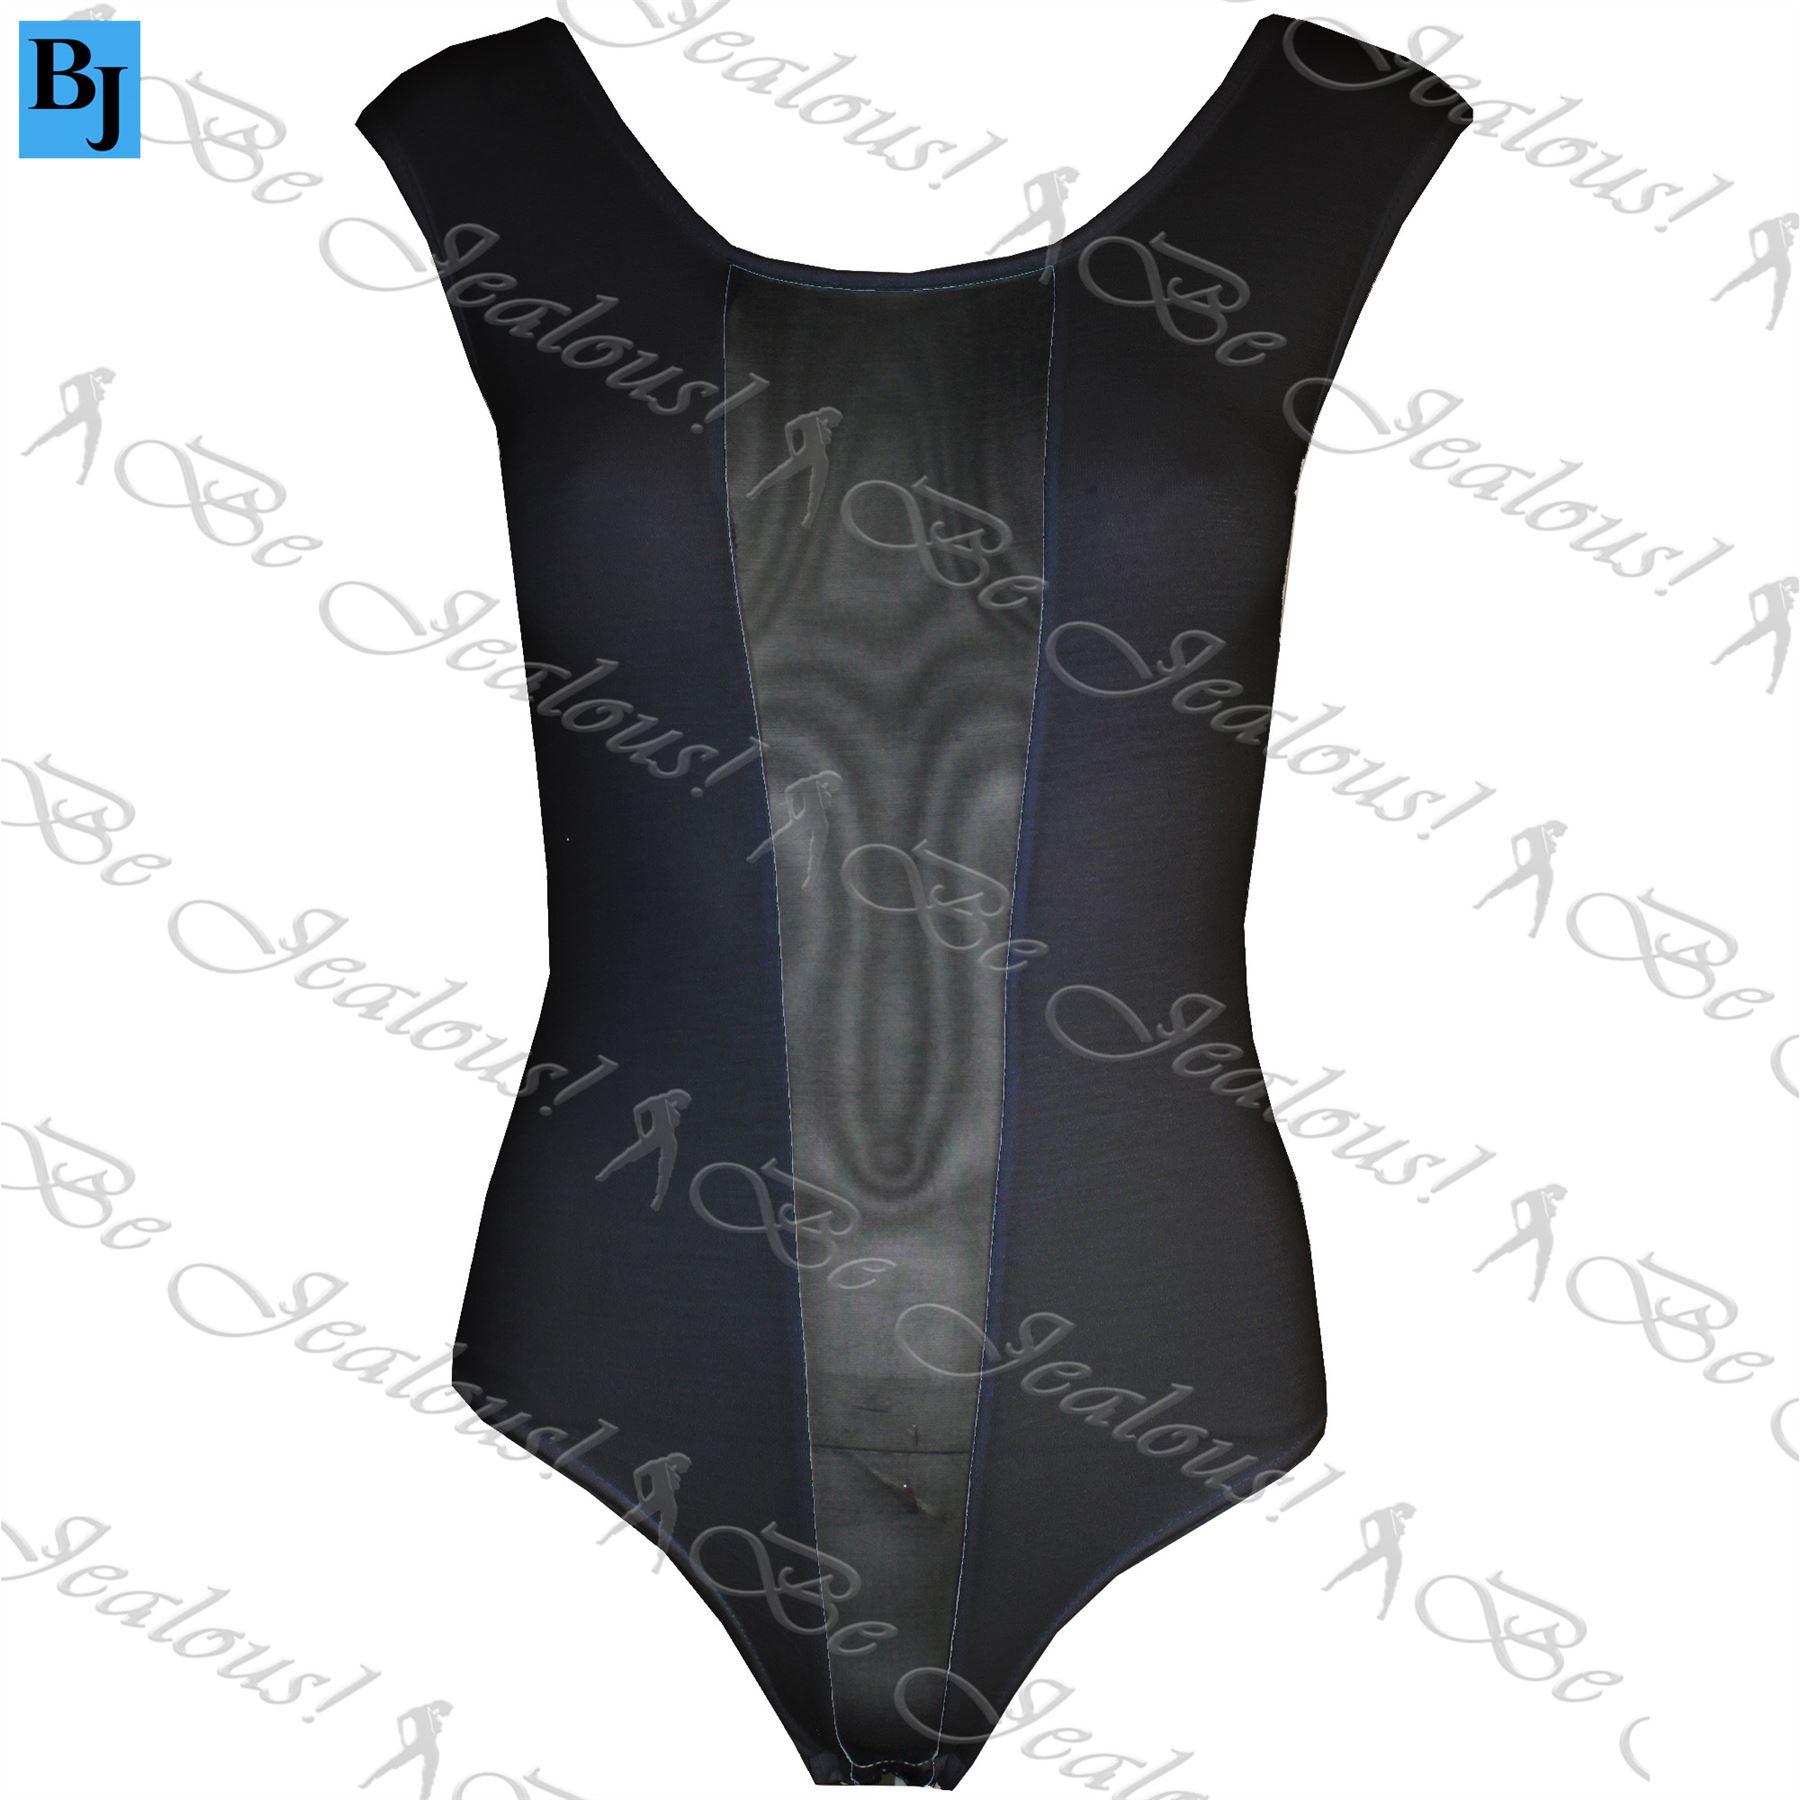 Womens Ladies Celeb Sleeveless Stretchy Mesh Insert Panel Bodysuit Leotard Top